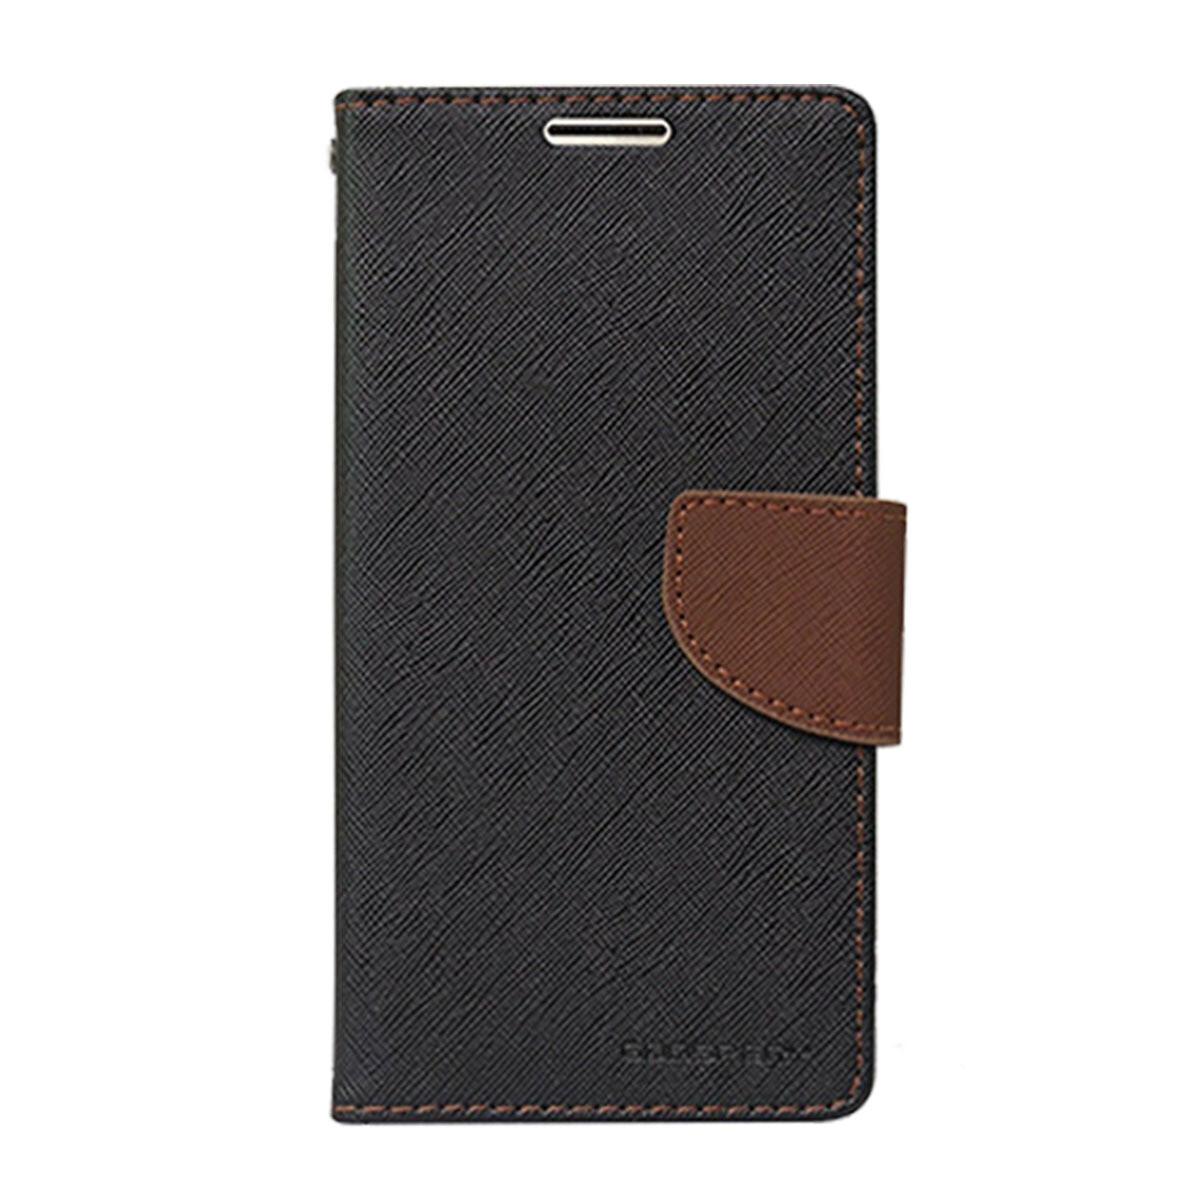 Estuche GOOSPERY Fancy Diary Negro/Cafe  - Iphone 6 Plus